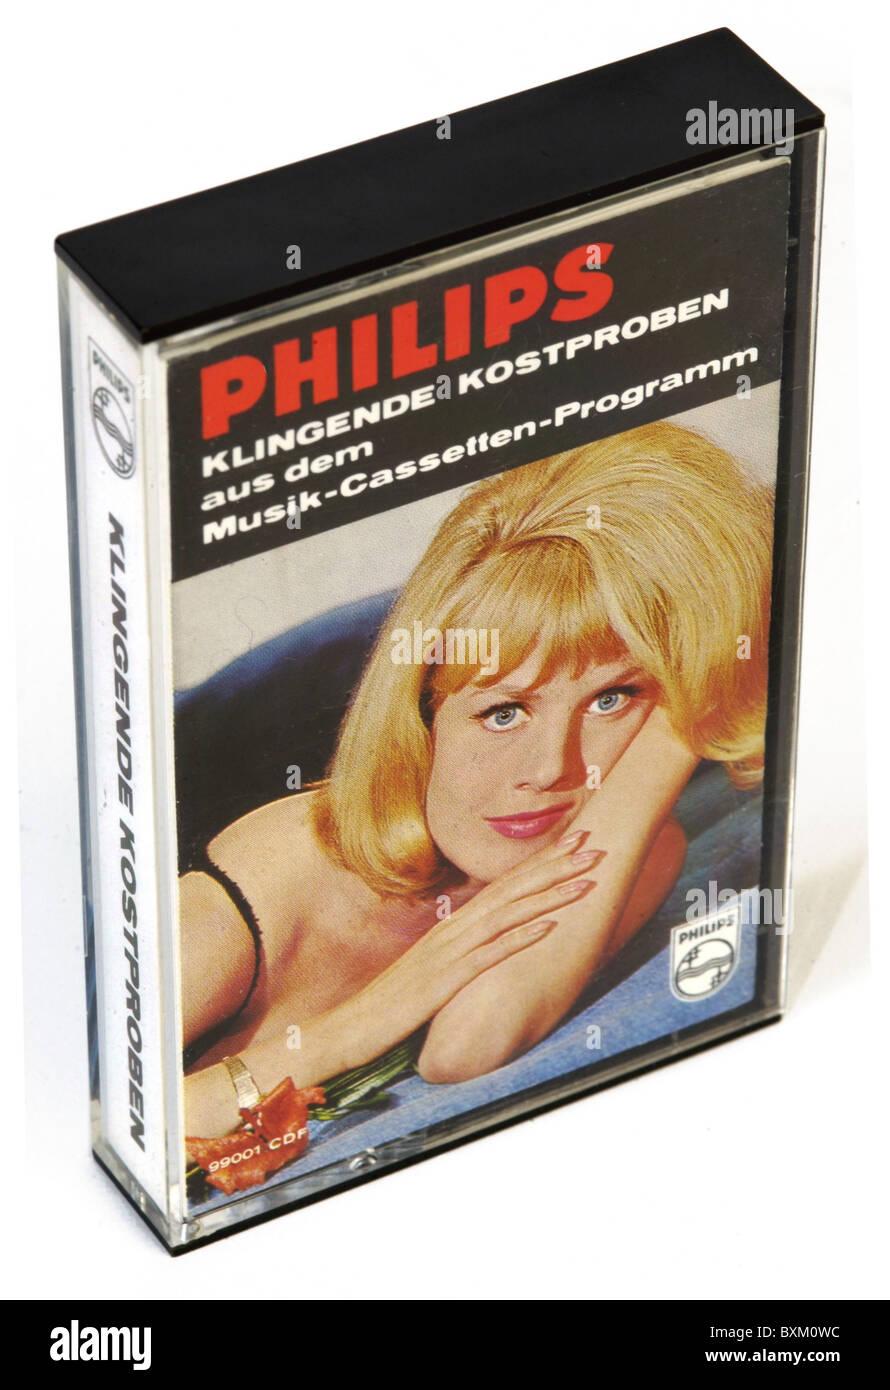 music, audio, Philips compact cassette mit: 'Klingende Kostproben aus dem Musik-Cassetten-Programm', Germany, - Stock Image